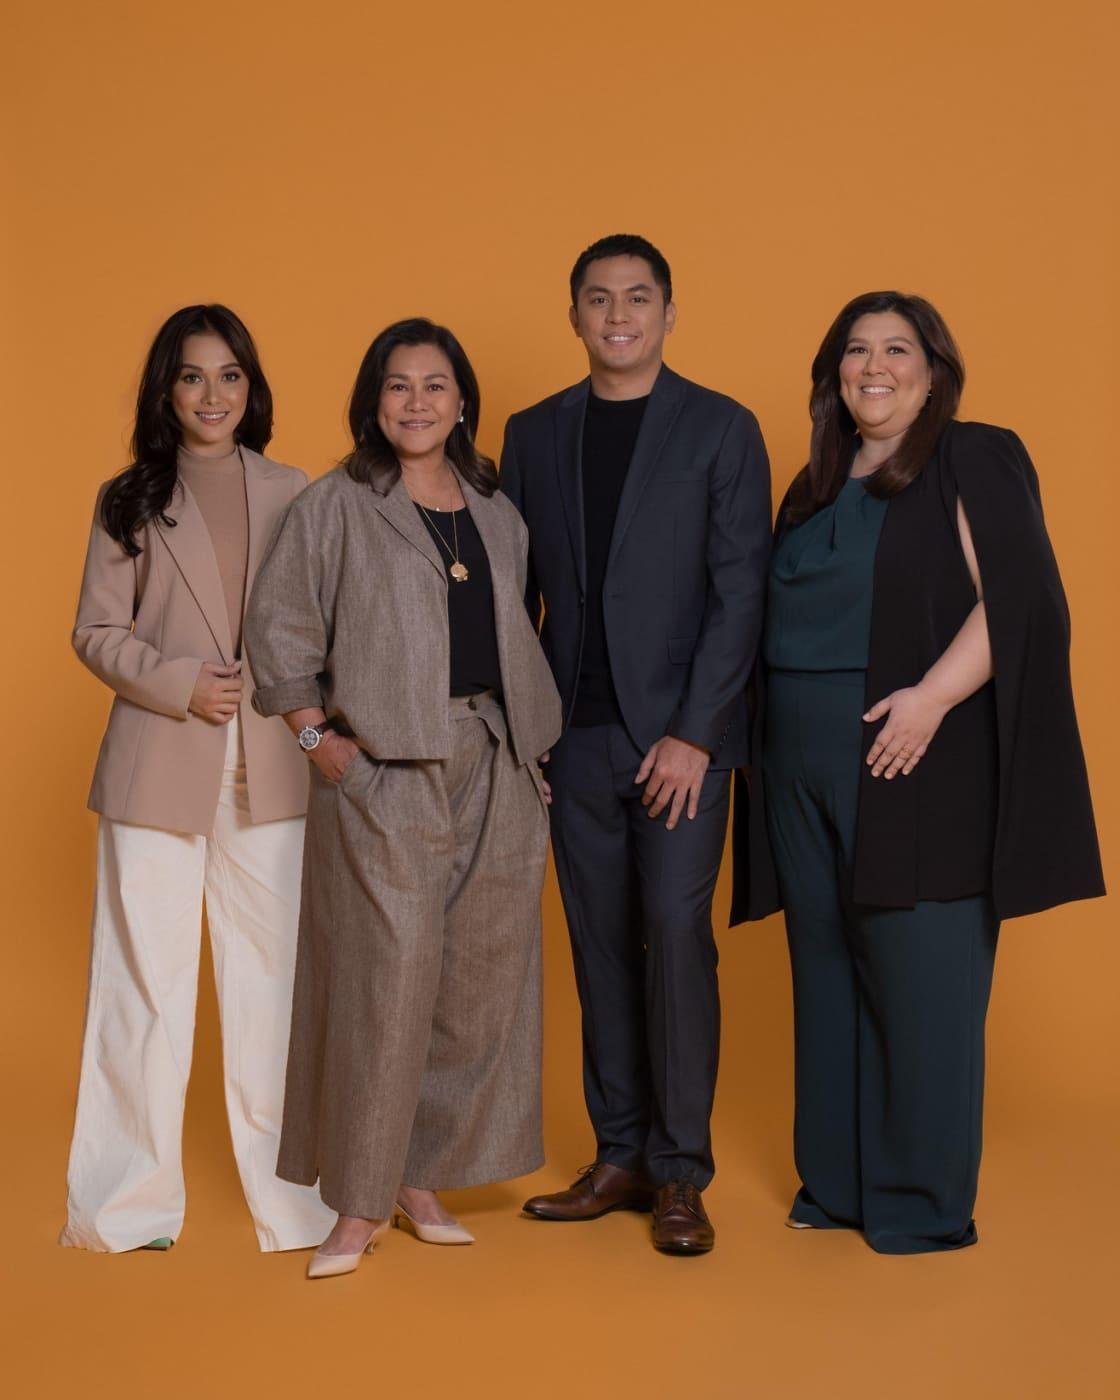 Maja Salvador with Crown Artist Management team